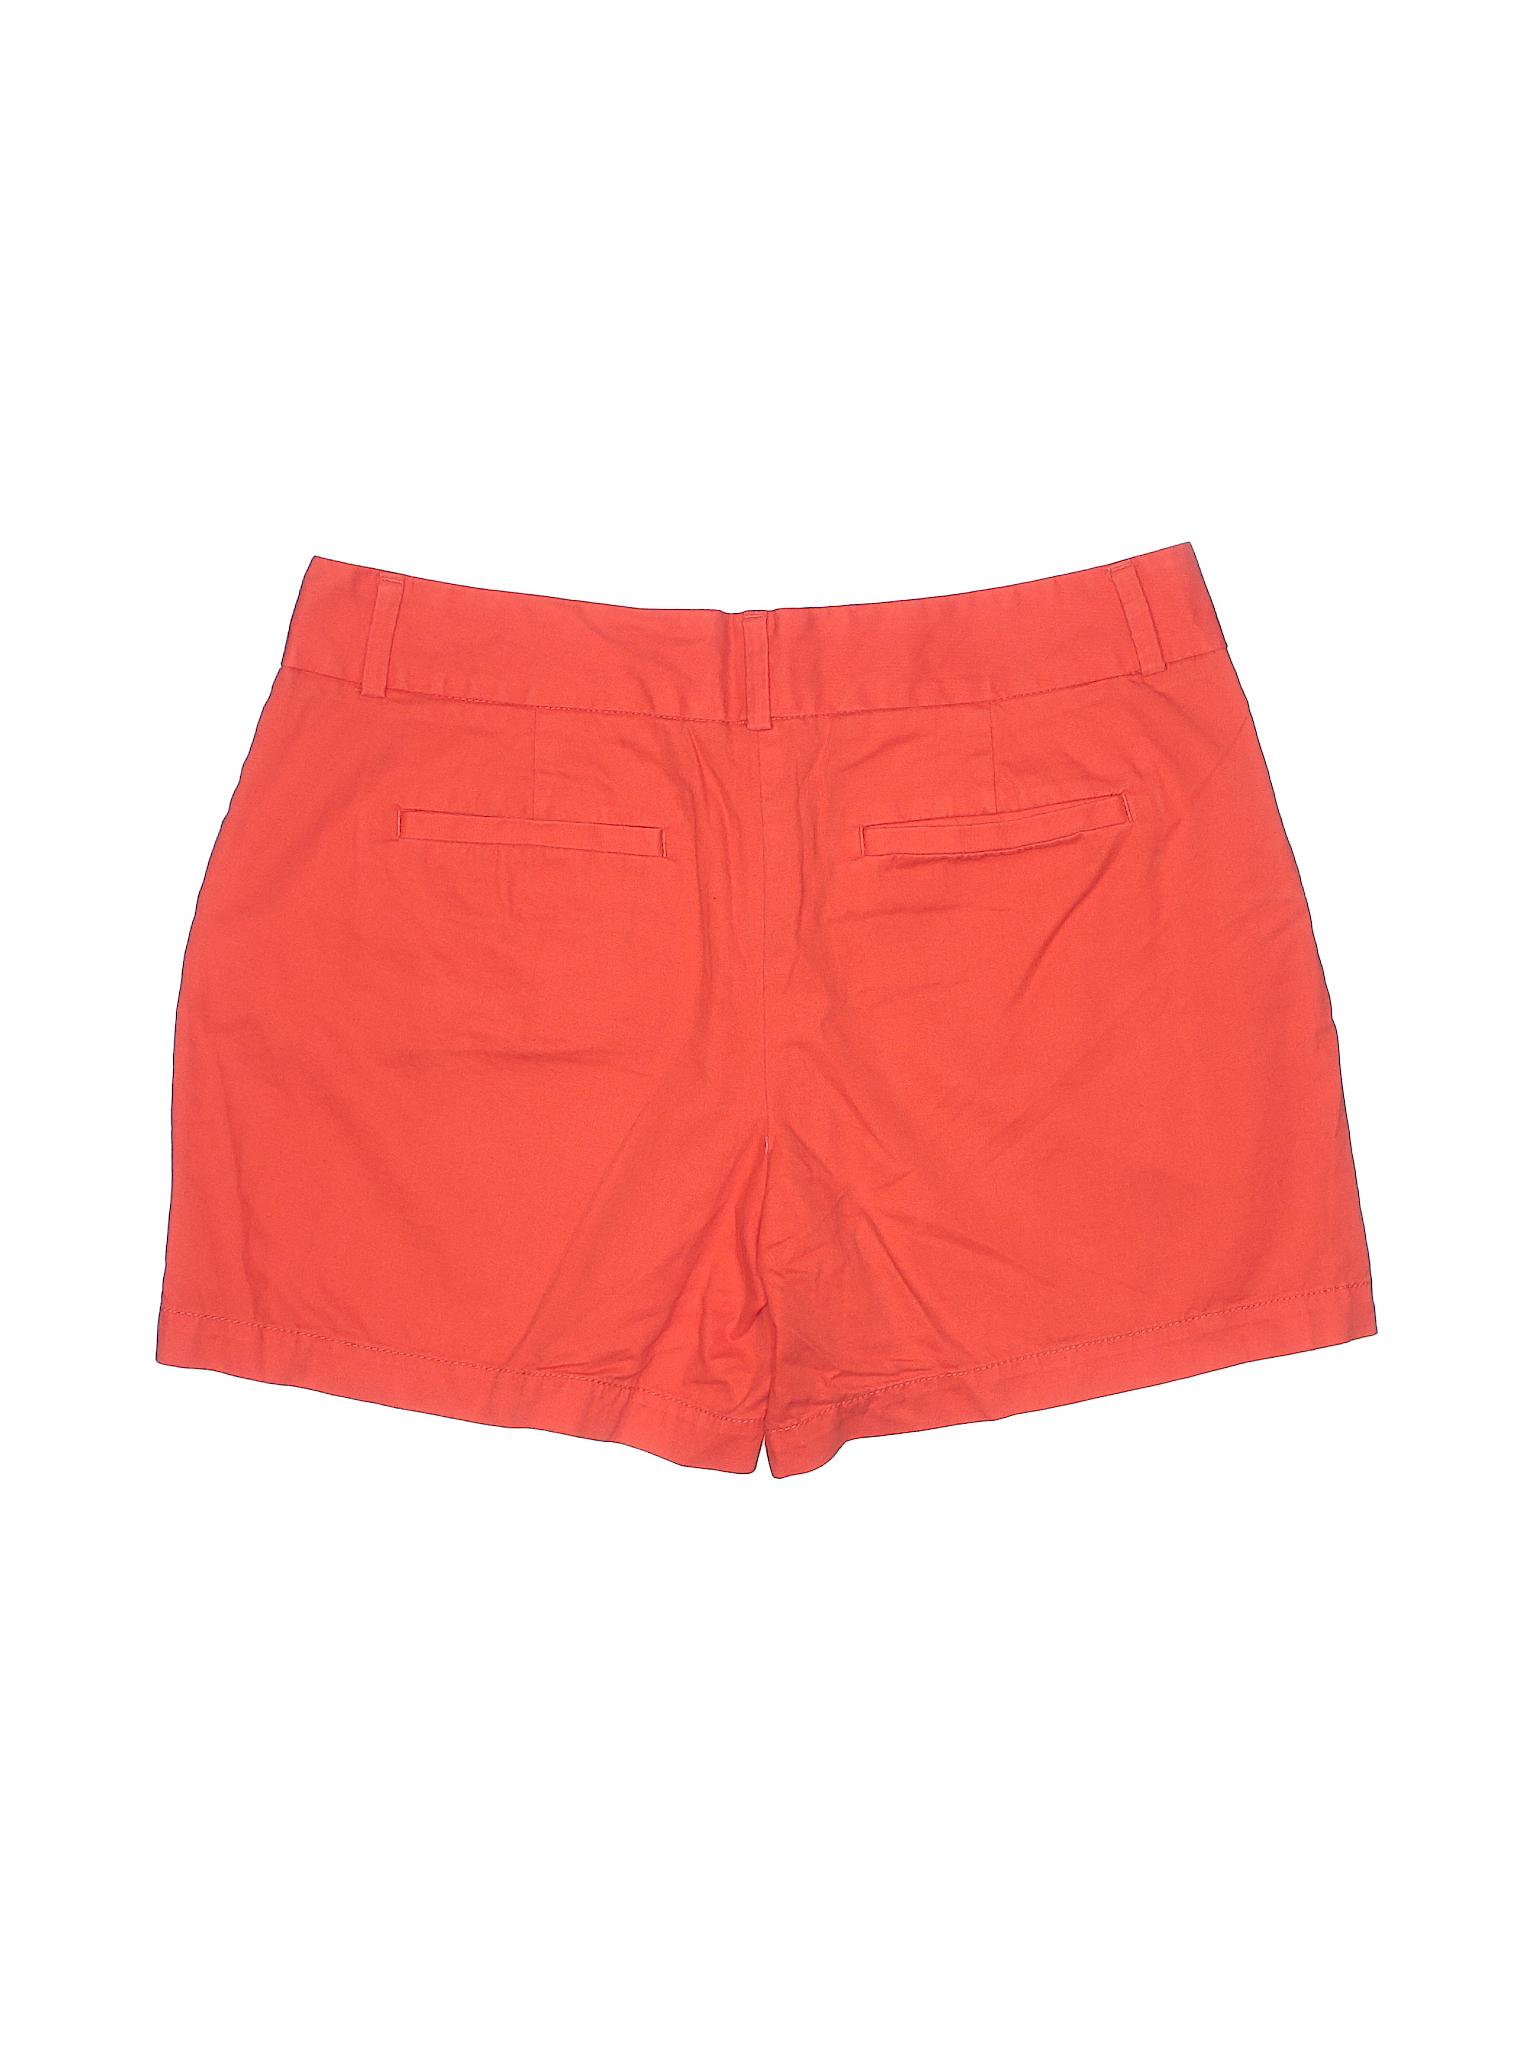 LOFT Boutique Shorts Khaki Taylor Ann nPxwECqB